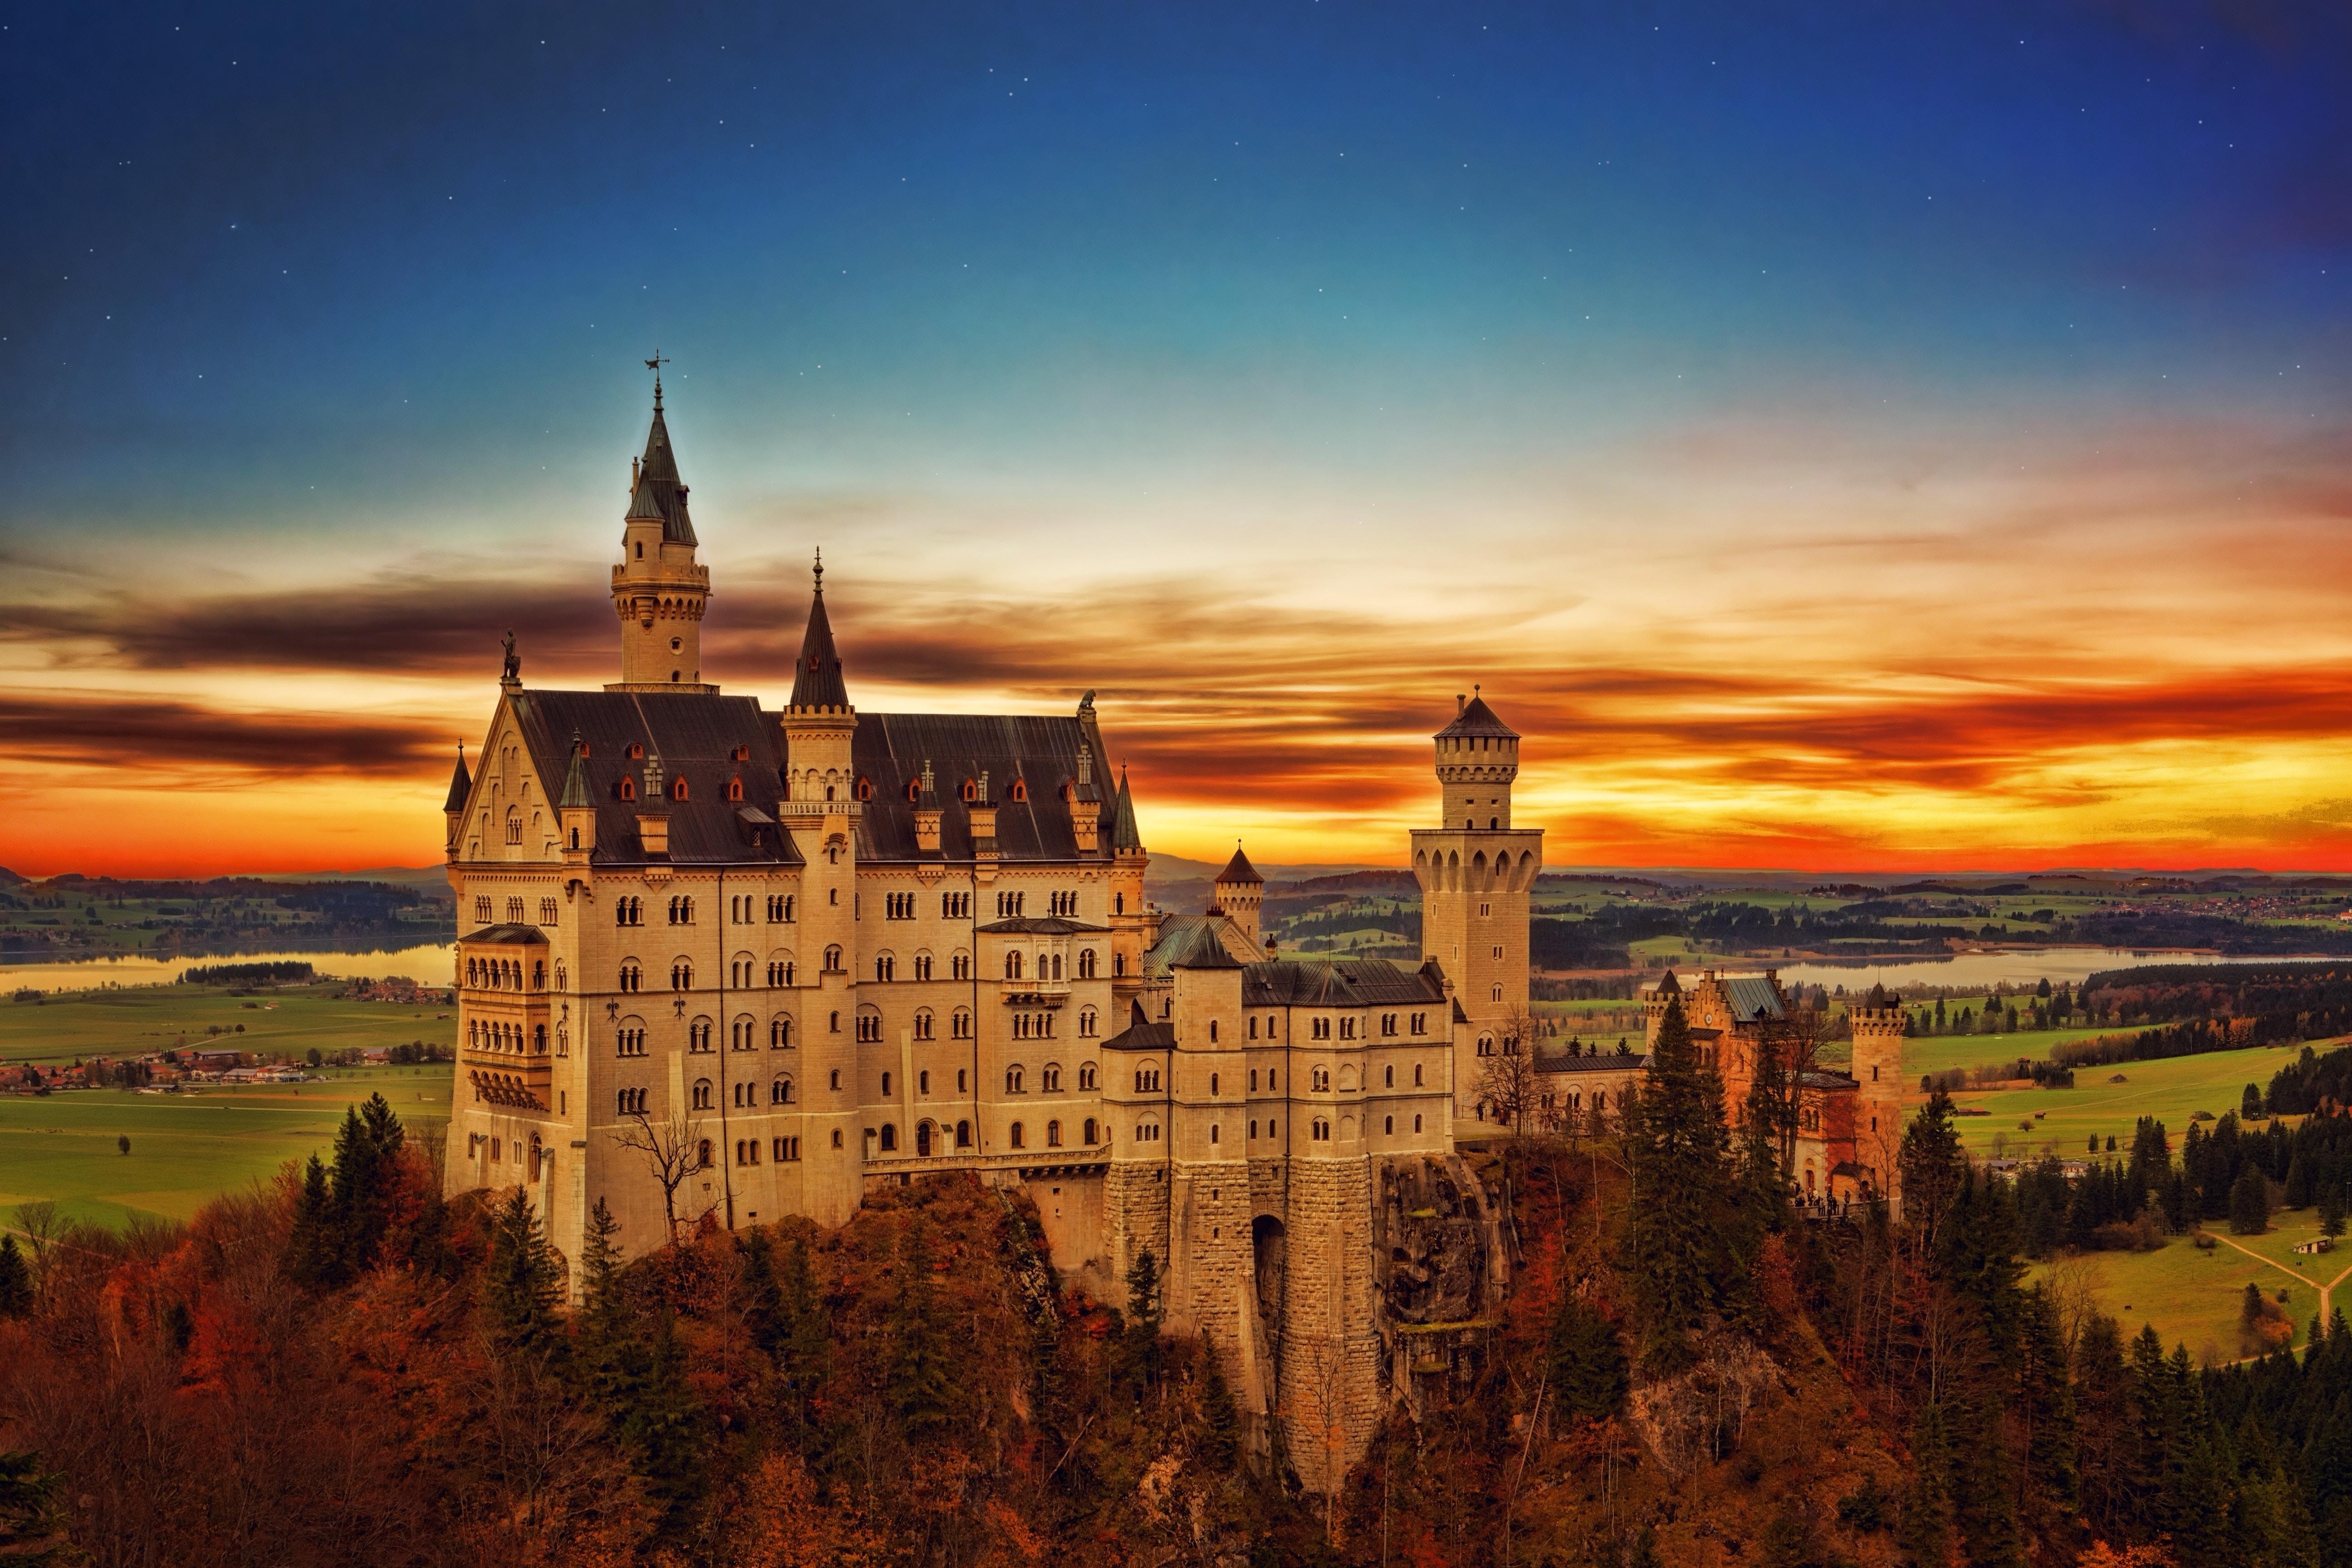 Image of Neuschwanstein Castle in Germany